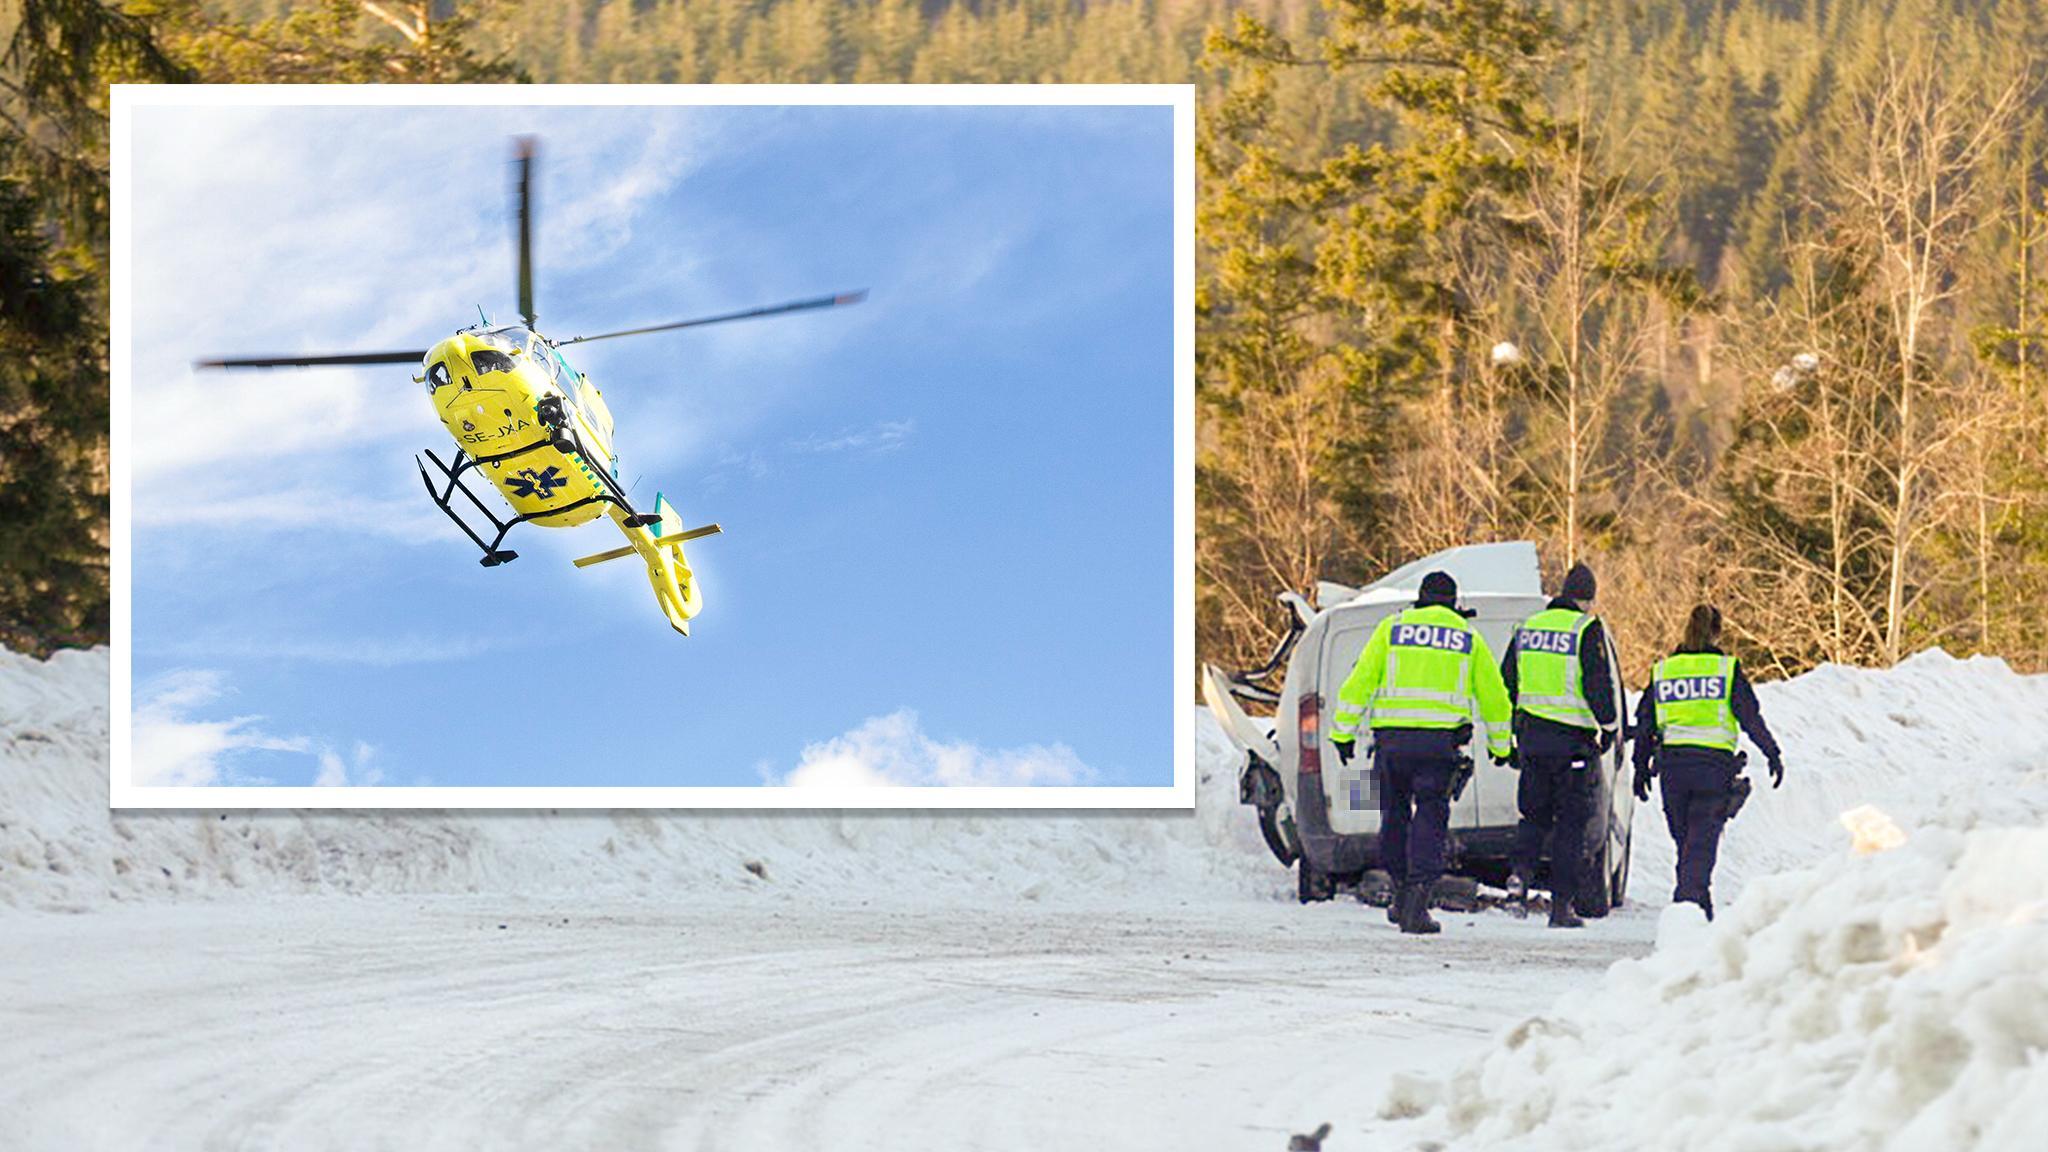 Flera skadade i krock ambulanshelikopter pa plats